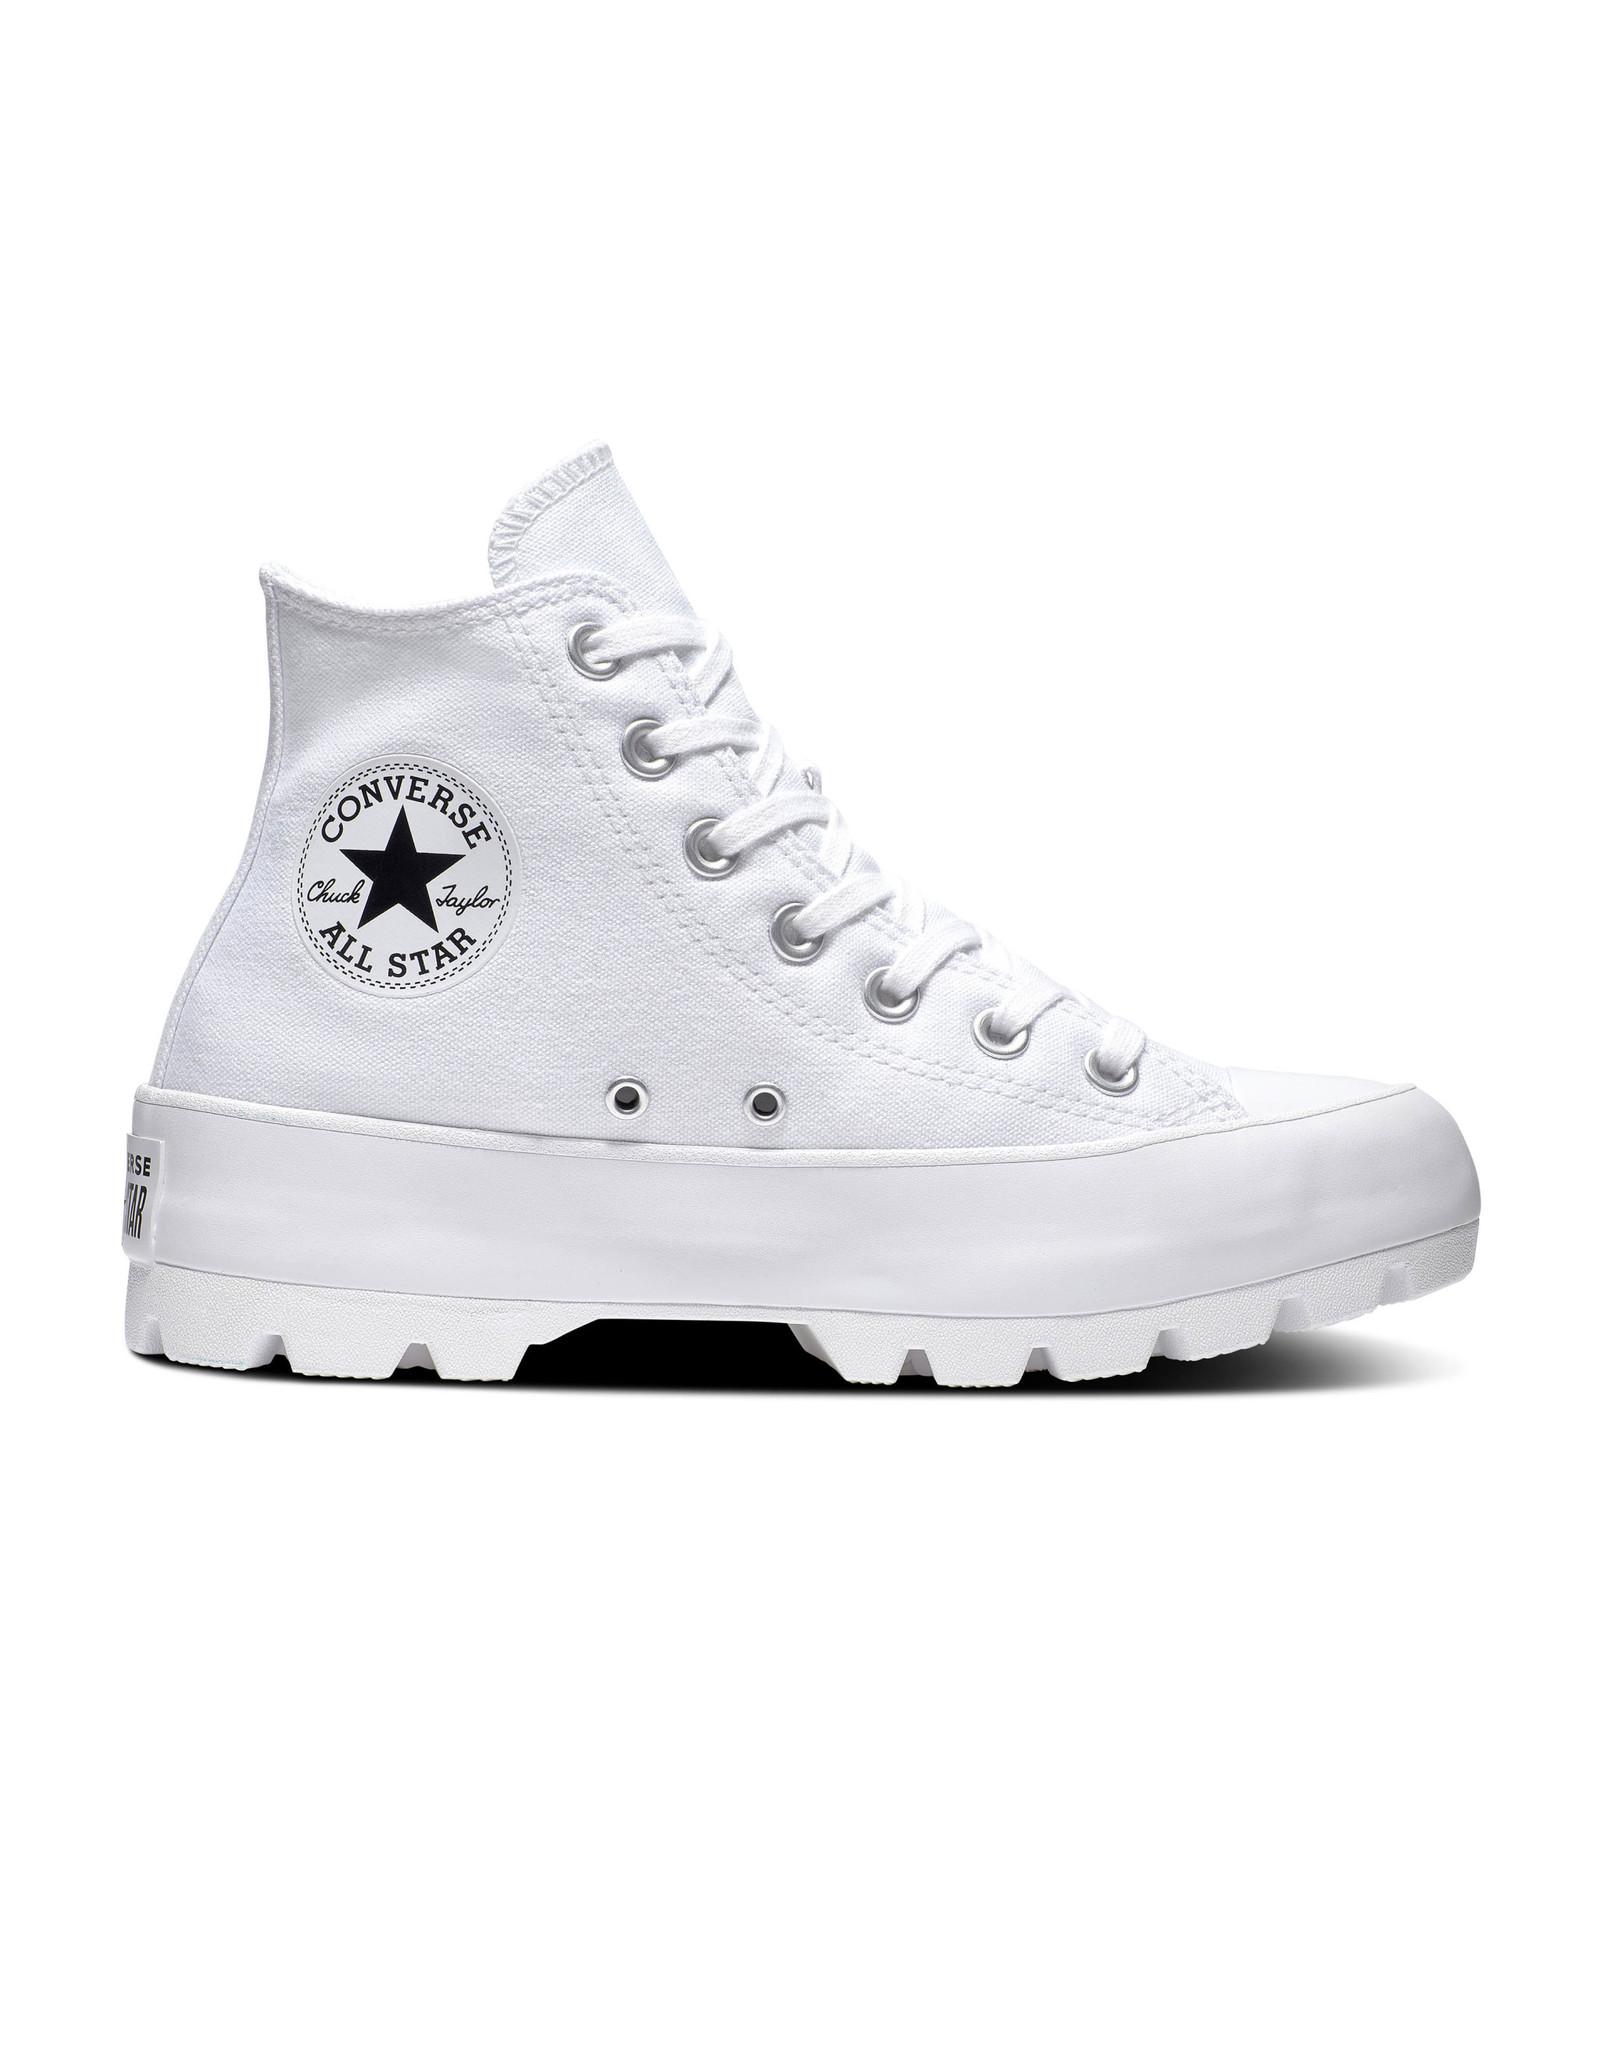 CONVERSE CHUCK TAYLOR ALL STAR LUGGED HI WHITE/BLACK/WHITE C994W-565902C